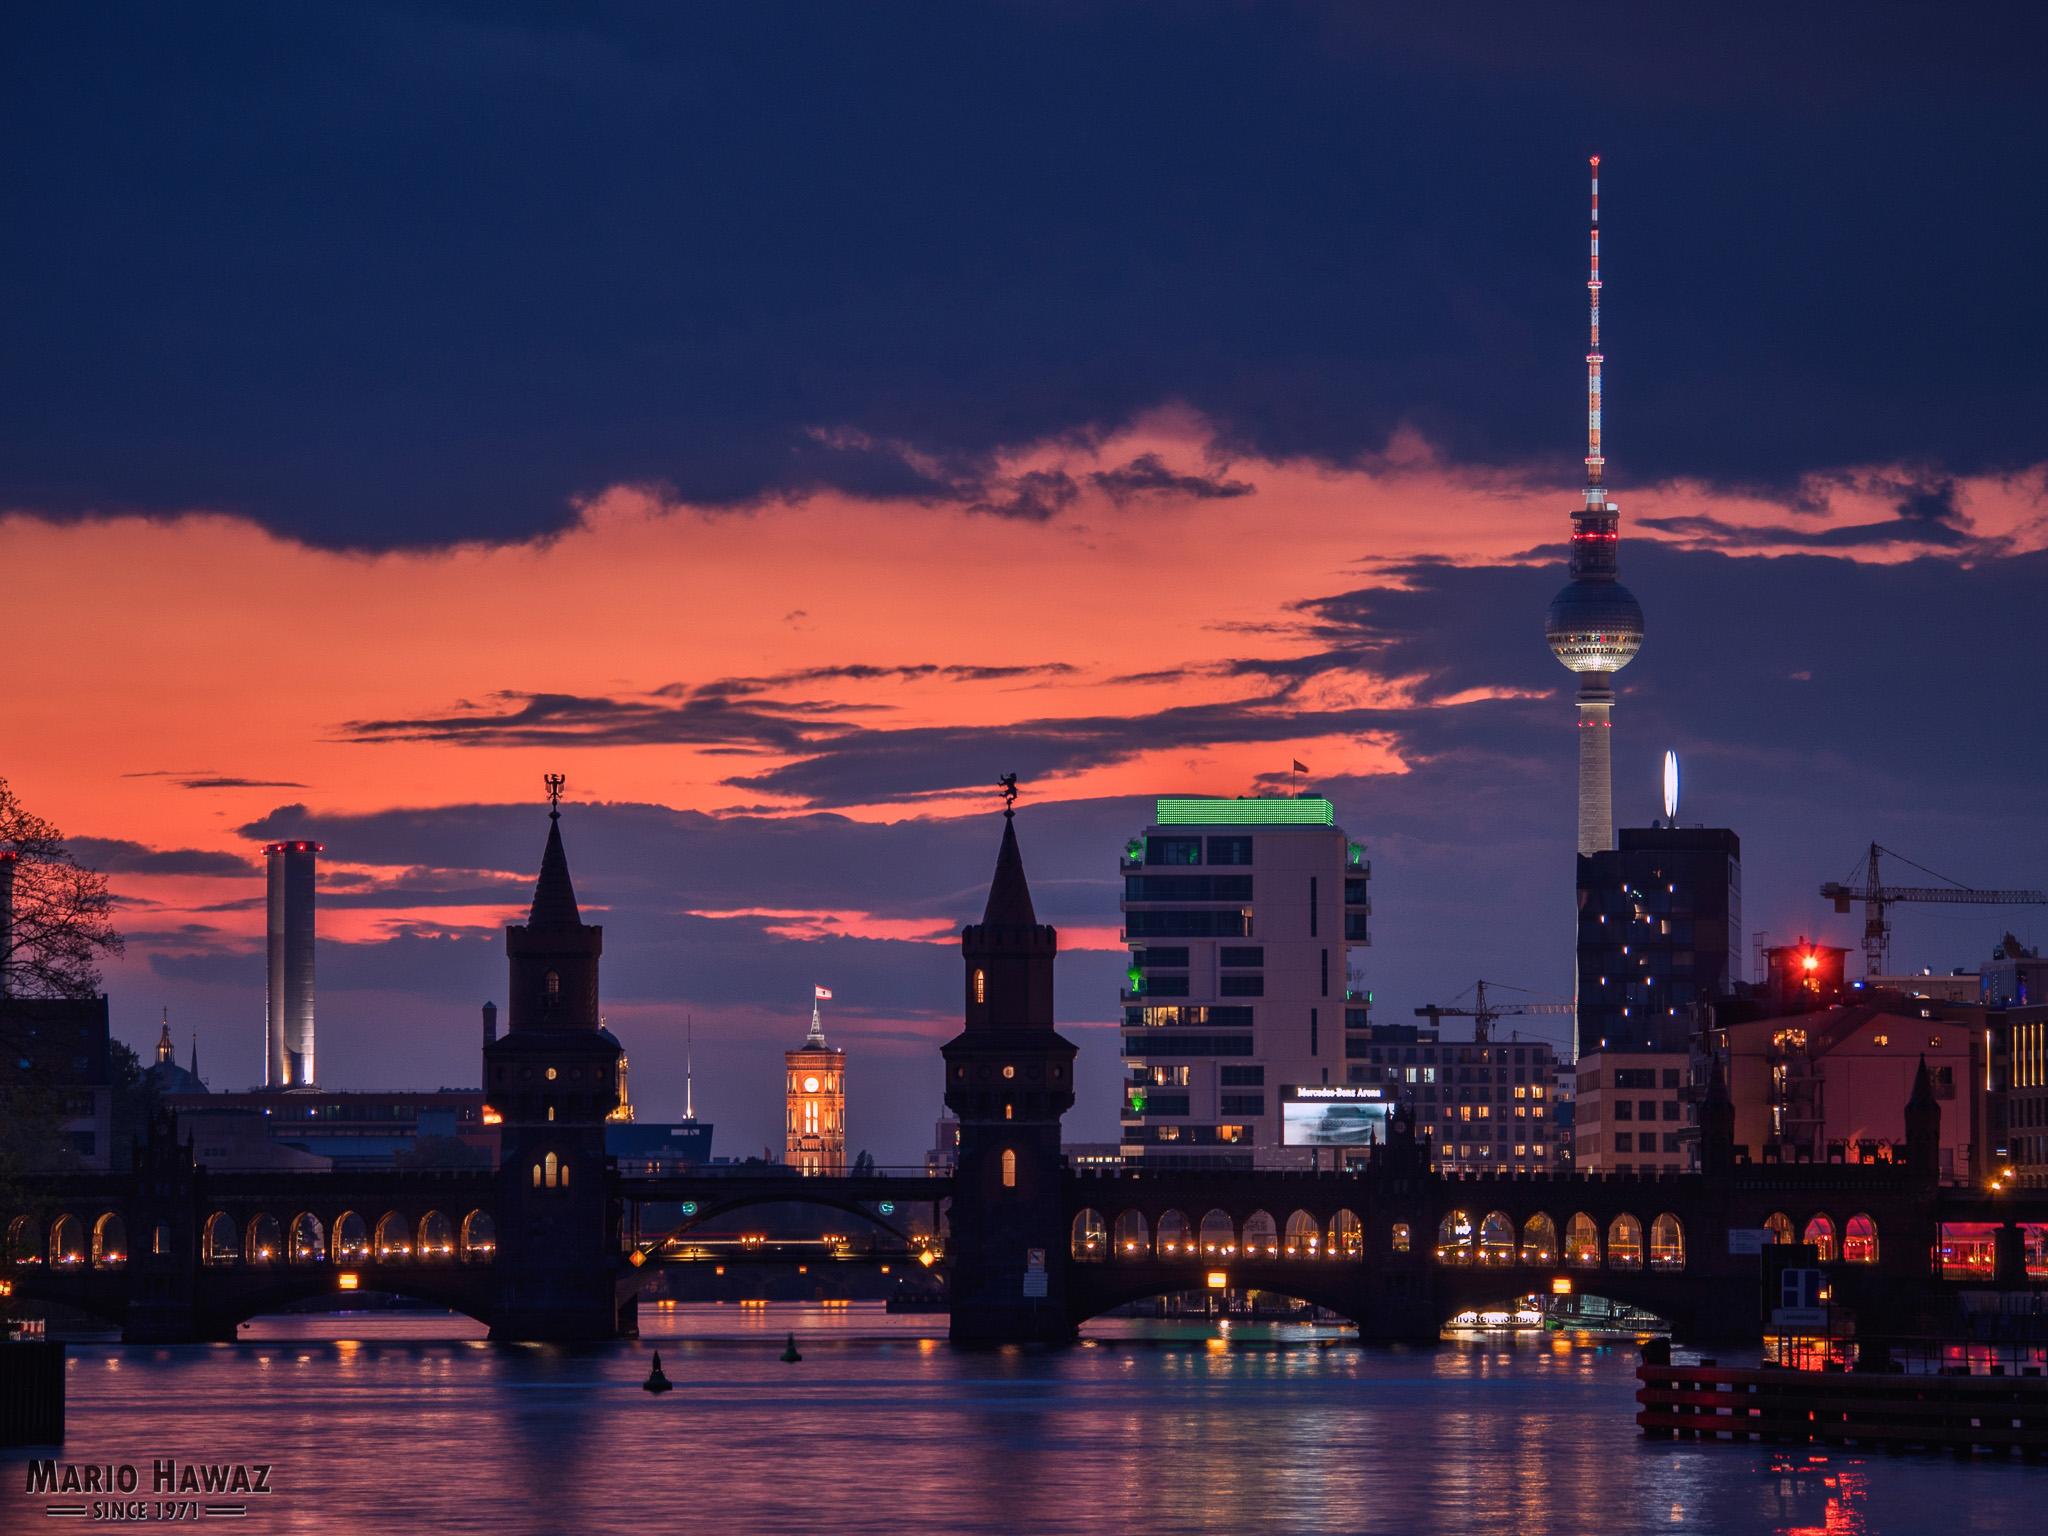 Spree riverside, Germany